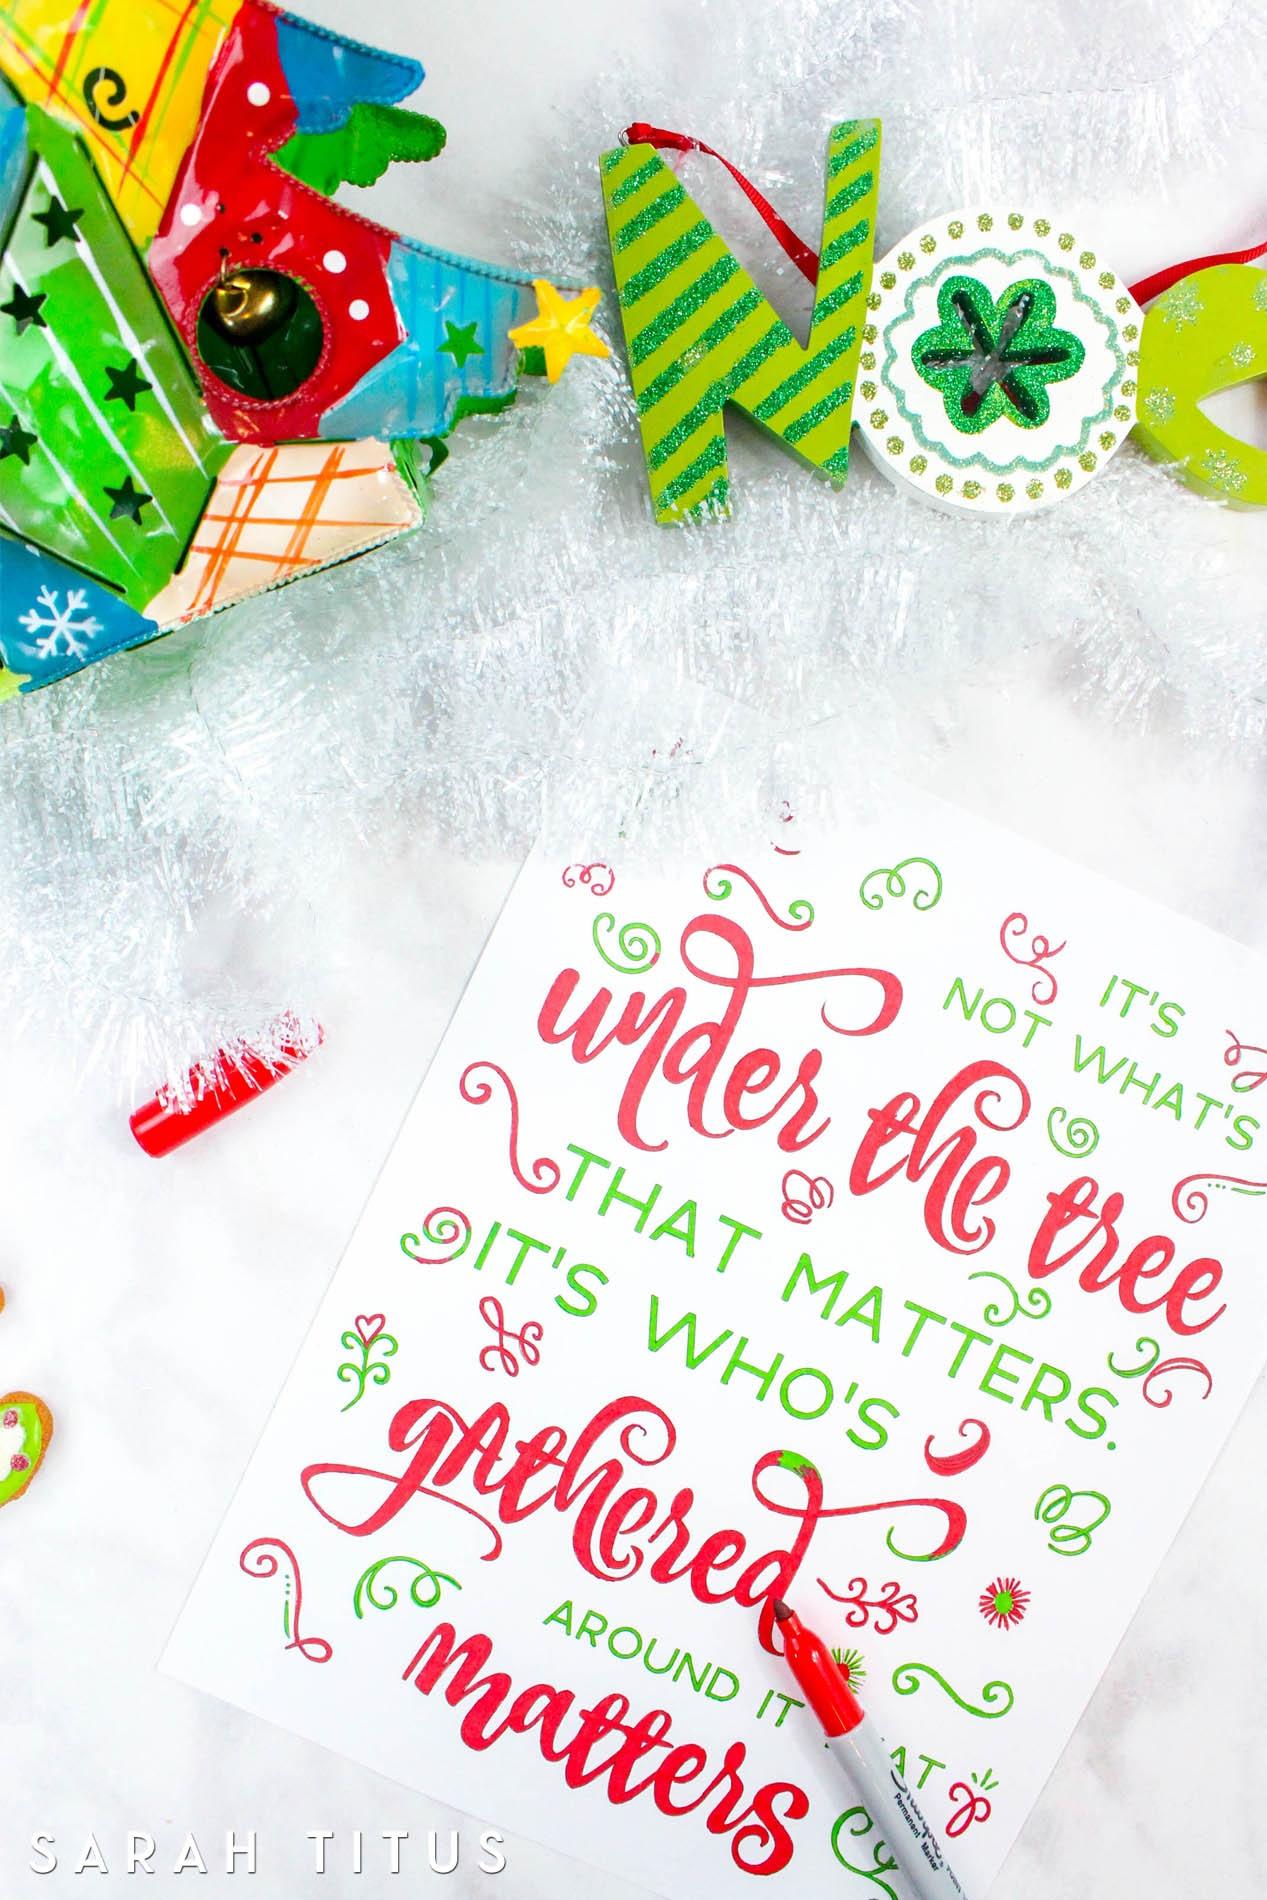 Free Printable Christmas Coloring Sheets - Sarah Titus - Free Printable Christmas Designs